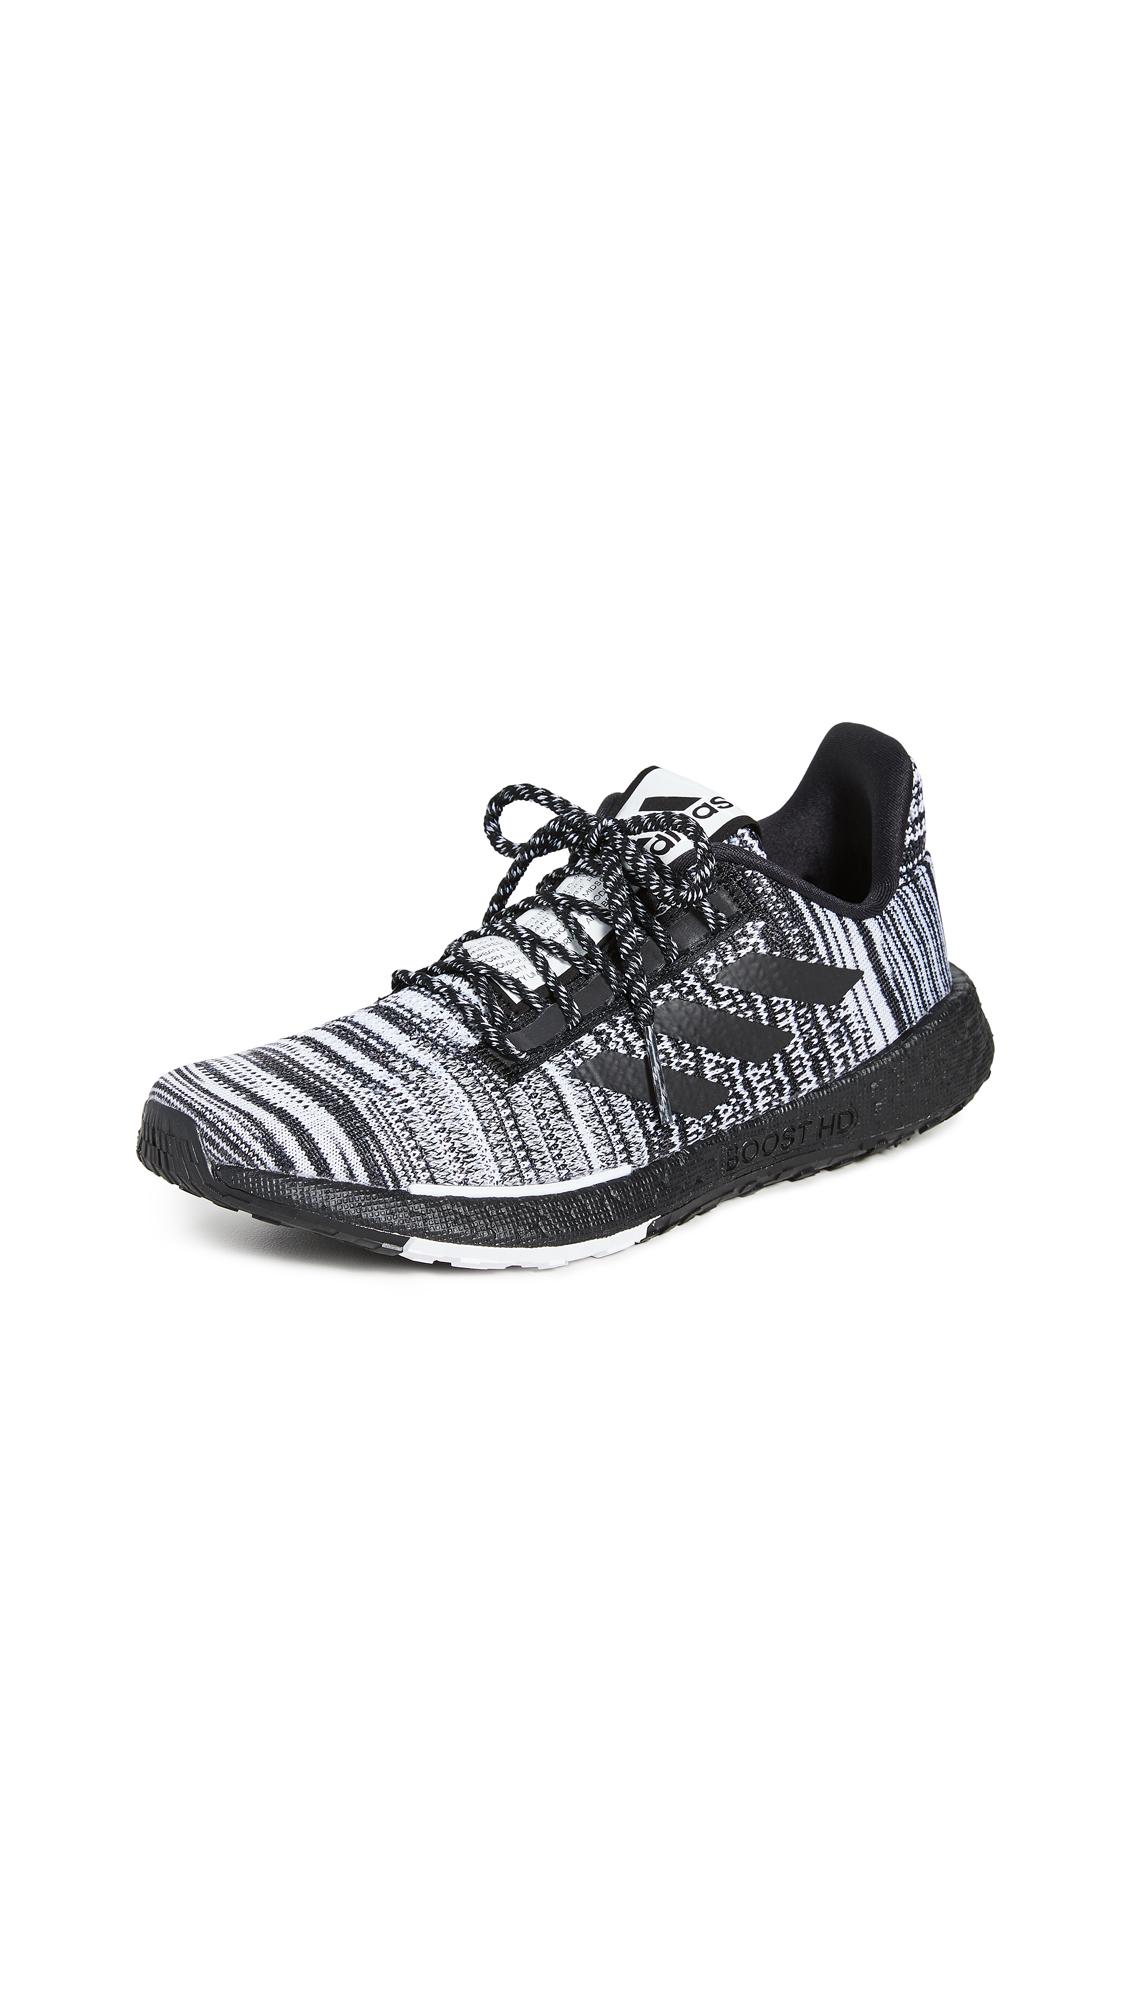 adidas x MISSONI Pulseboost HD Sneakers - 50% Off Sale